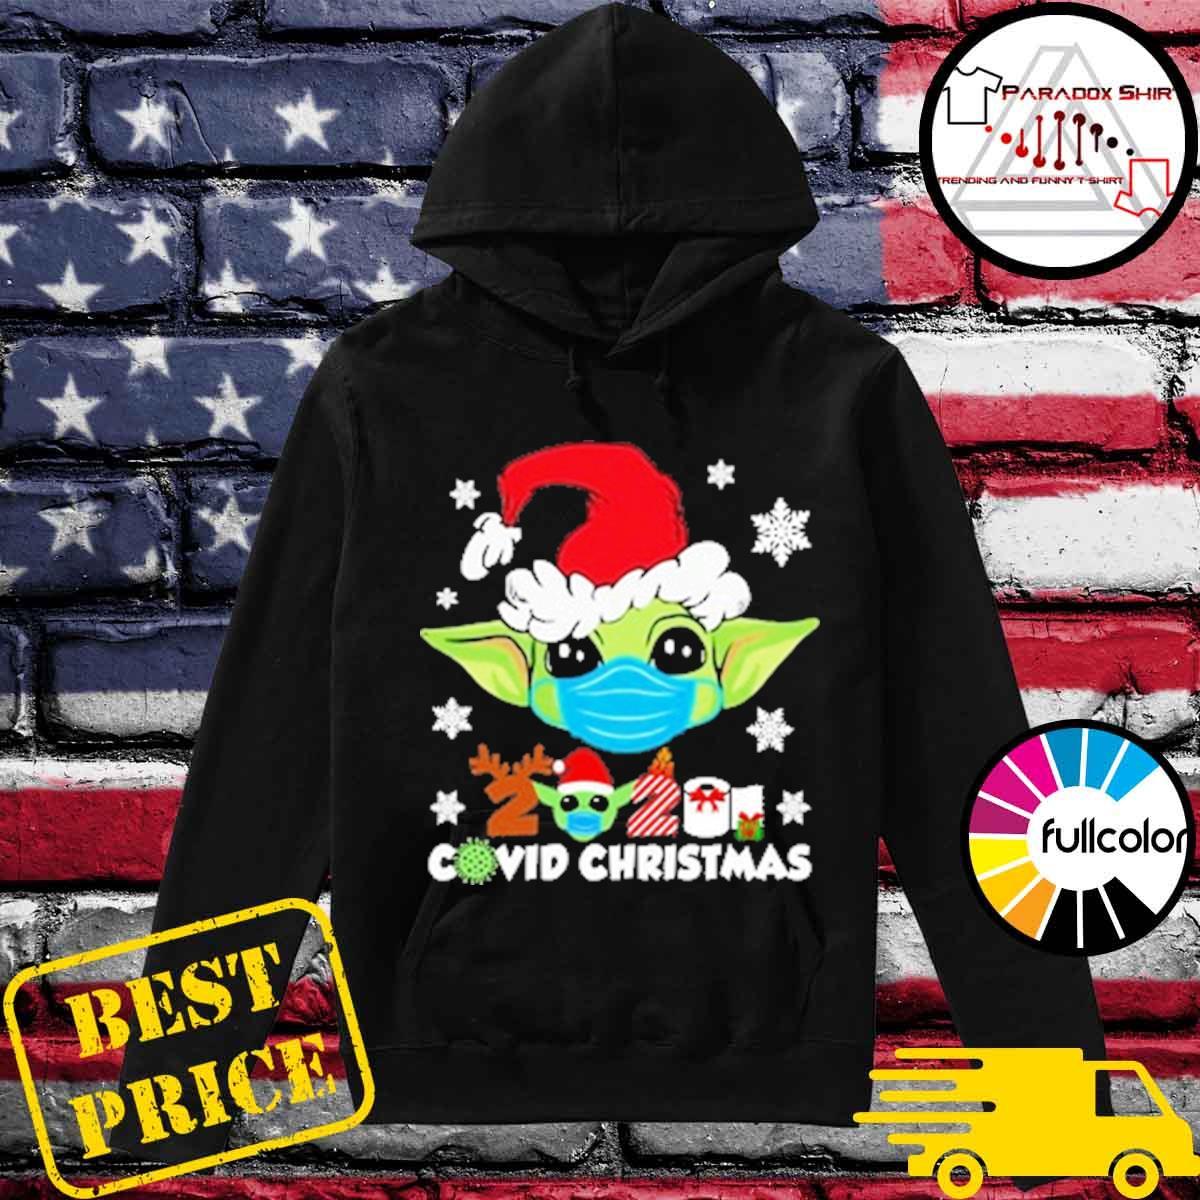 Official Santa Baby Yoda face mask 2020 Covid Christmas s Hoodie